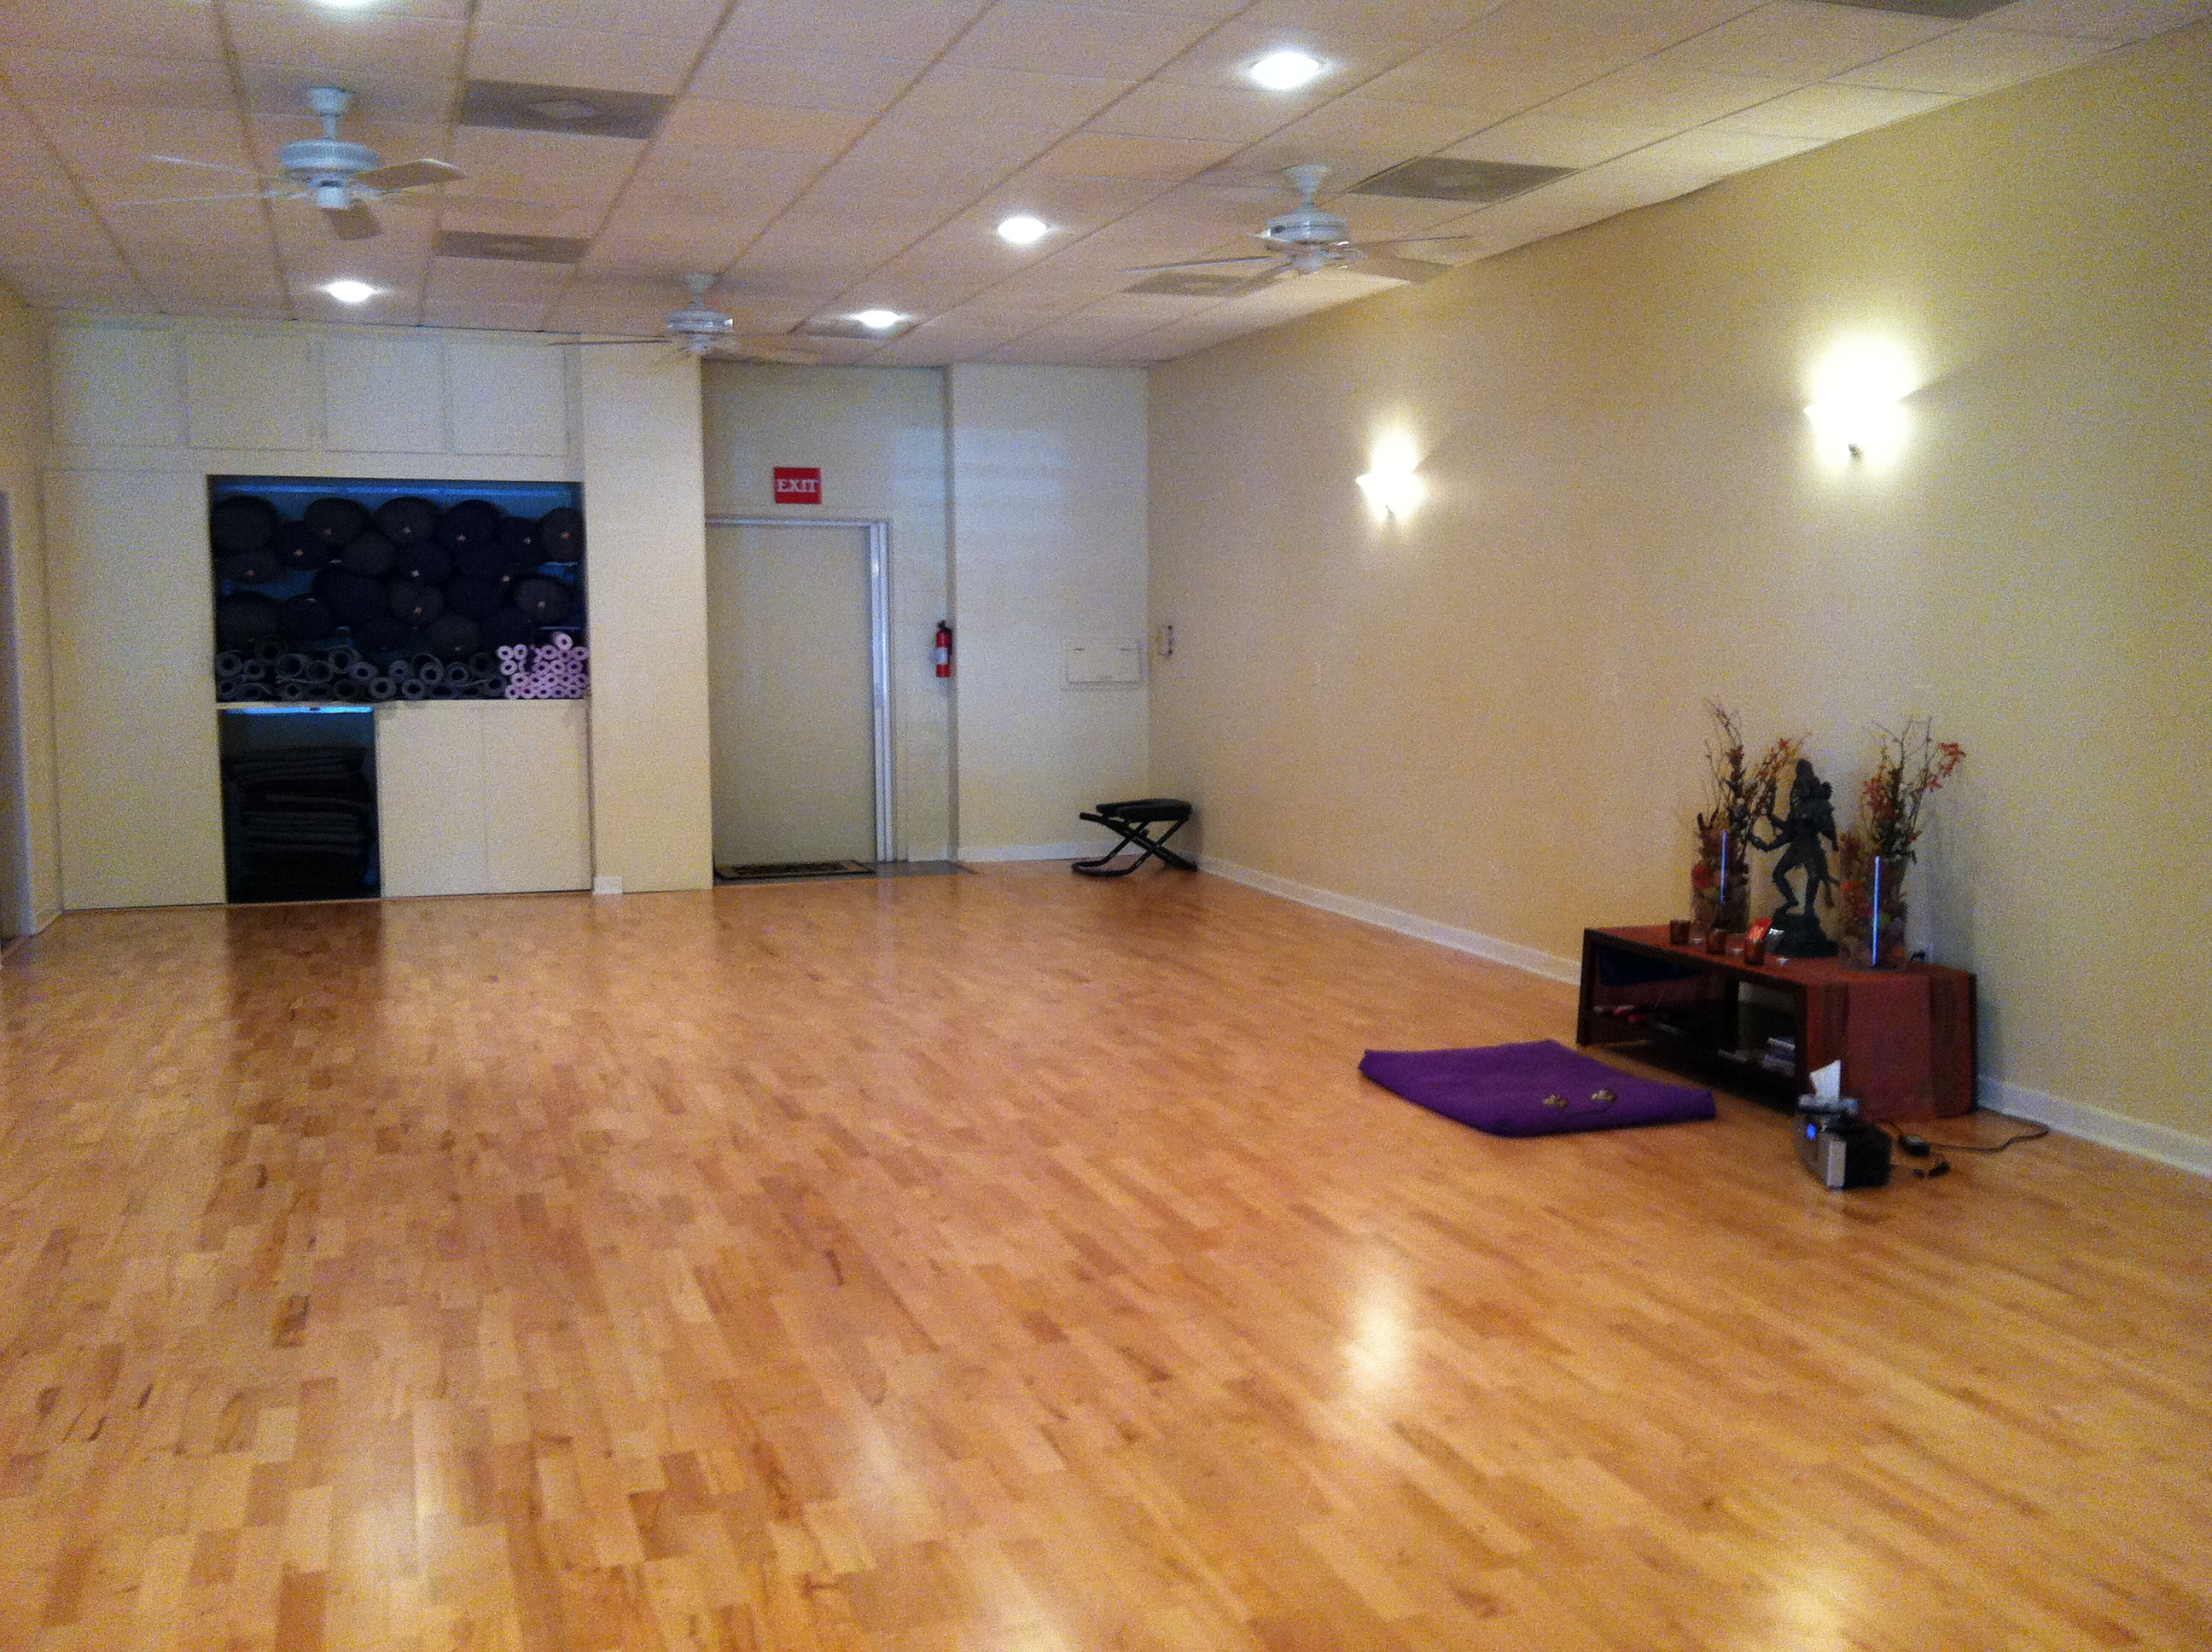 The Woodlands Yoga Studio image 0